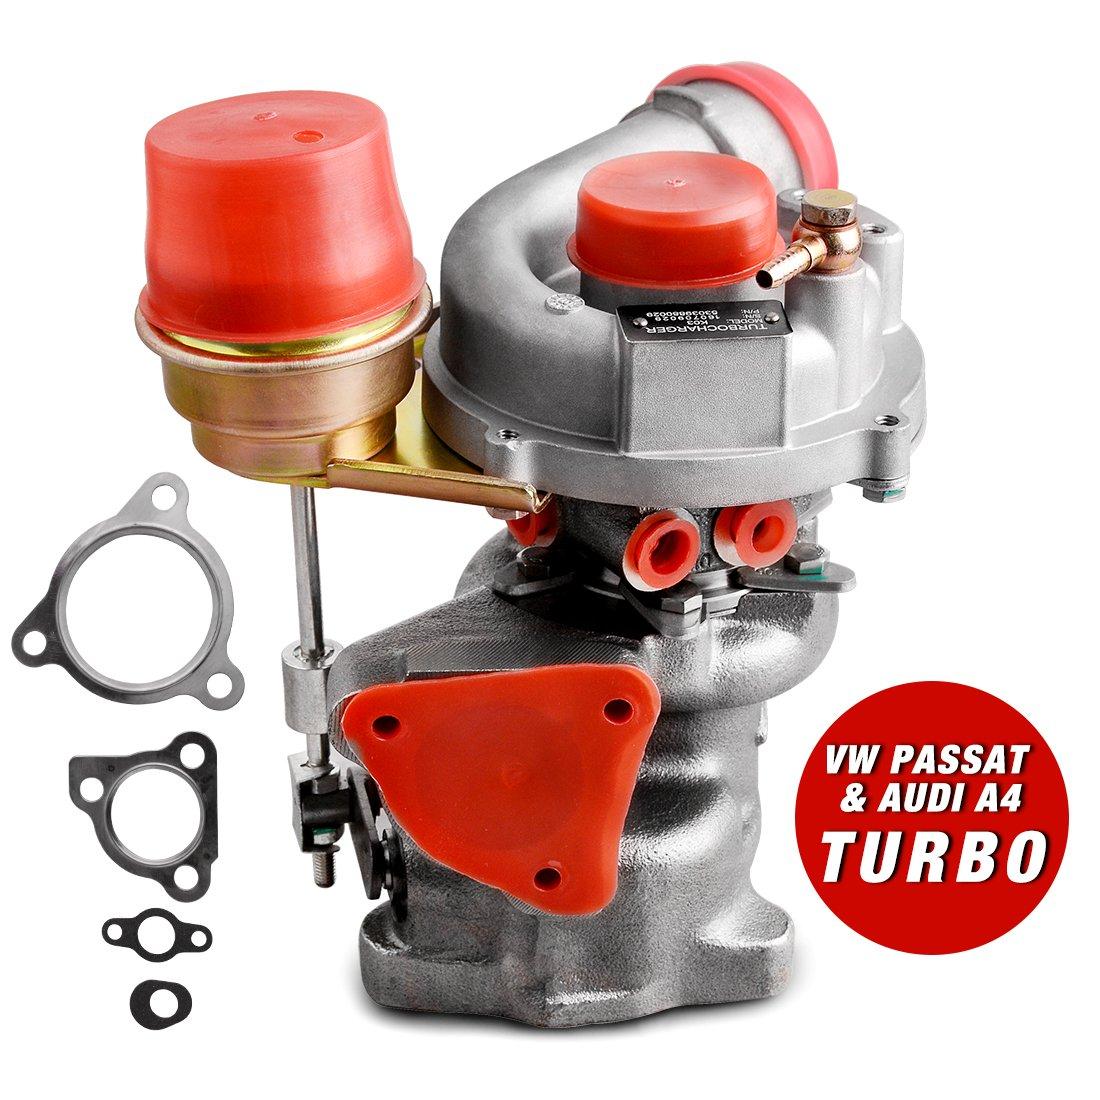 New Genuine Turbo Exact Fit Turbocharger for 1997-2006,Volkswagen & AUDI A4 Quattro AUTOSAVER88 1.8T Turbo Kit W/Premium K03 Turbocharger & Gaskets, 1 Year Warranty